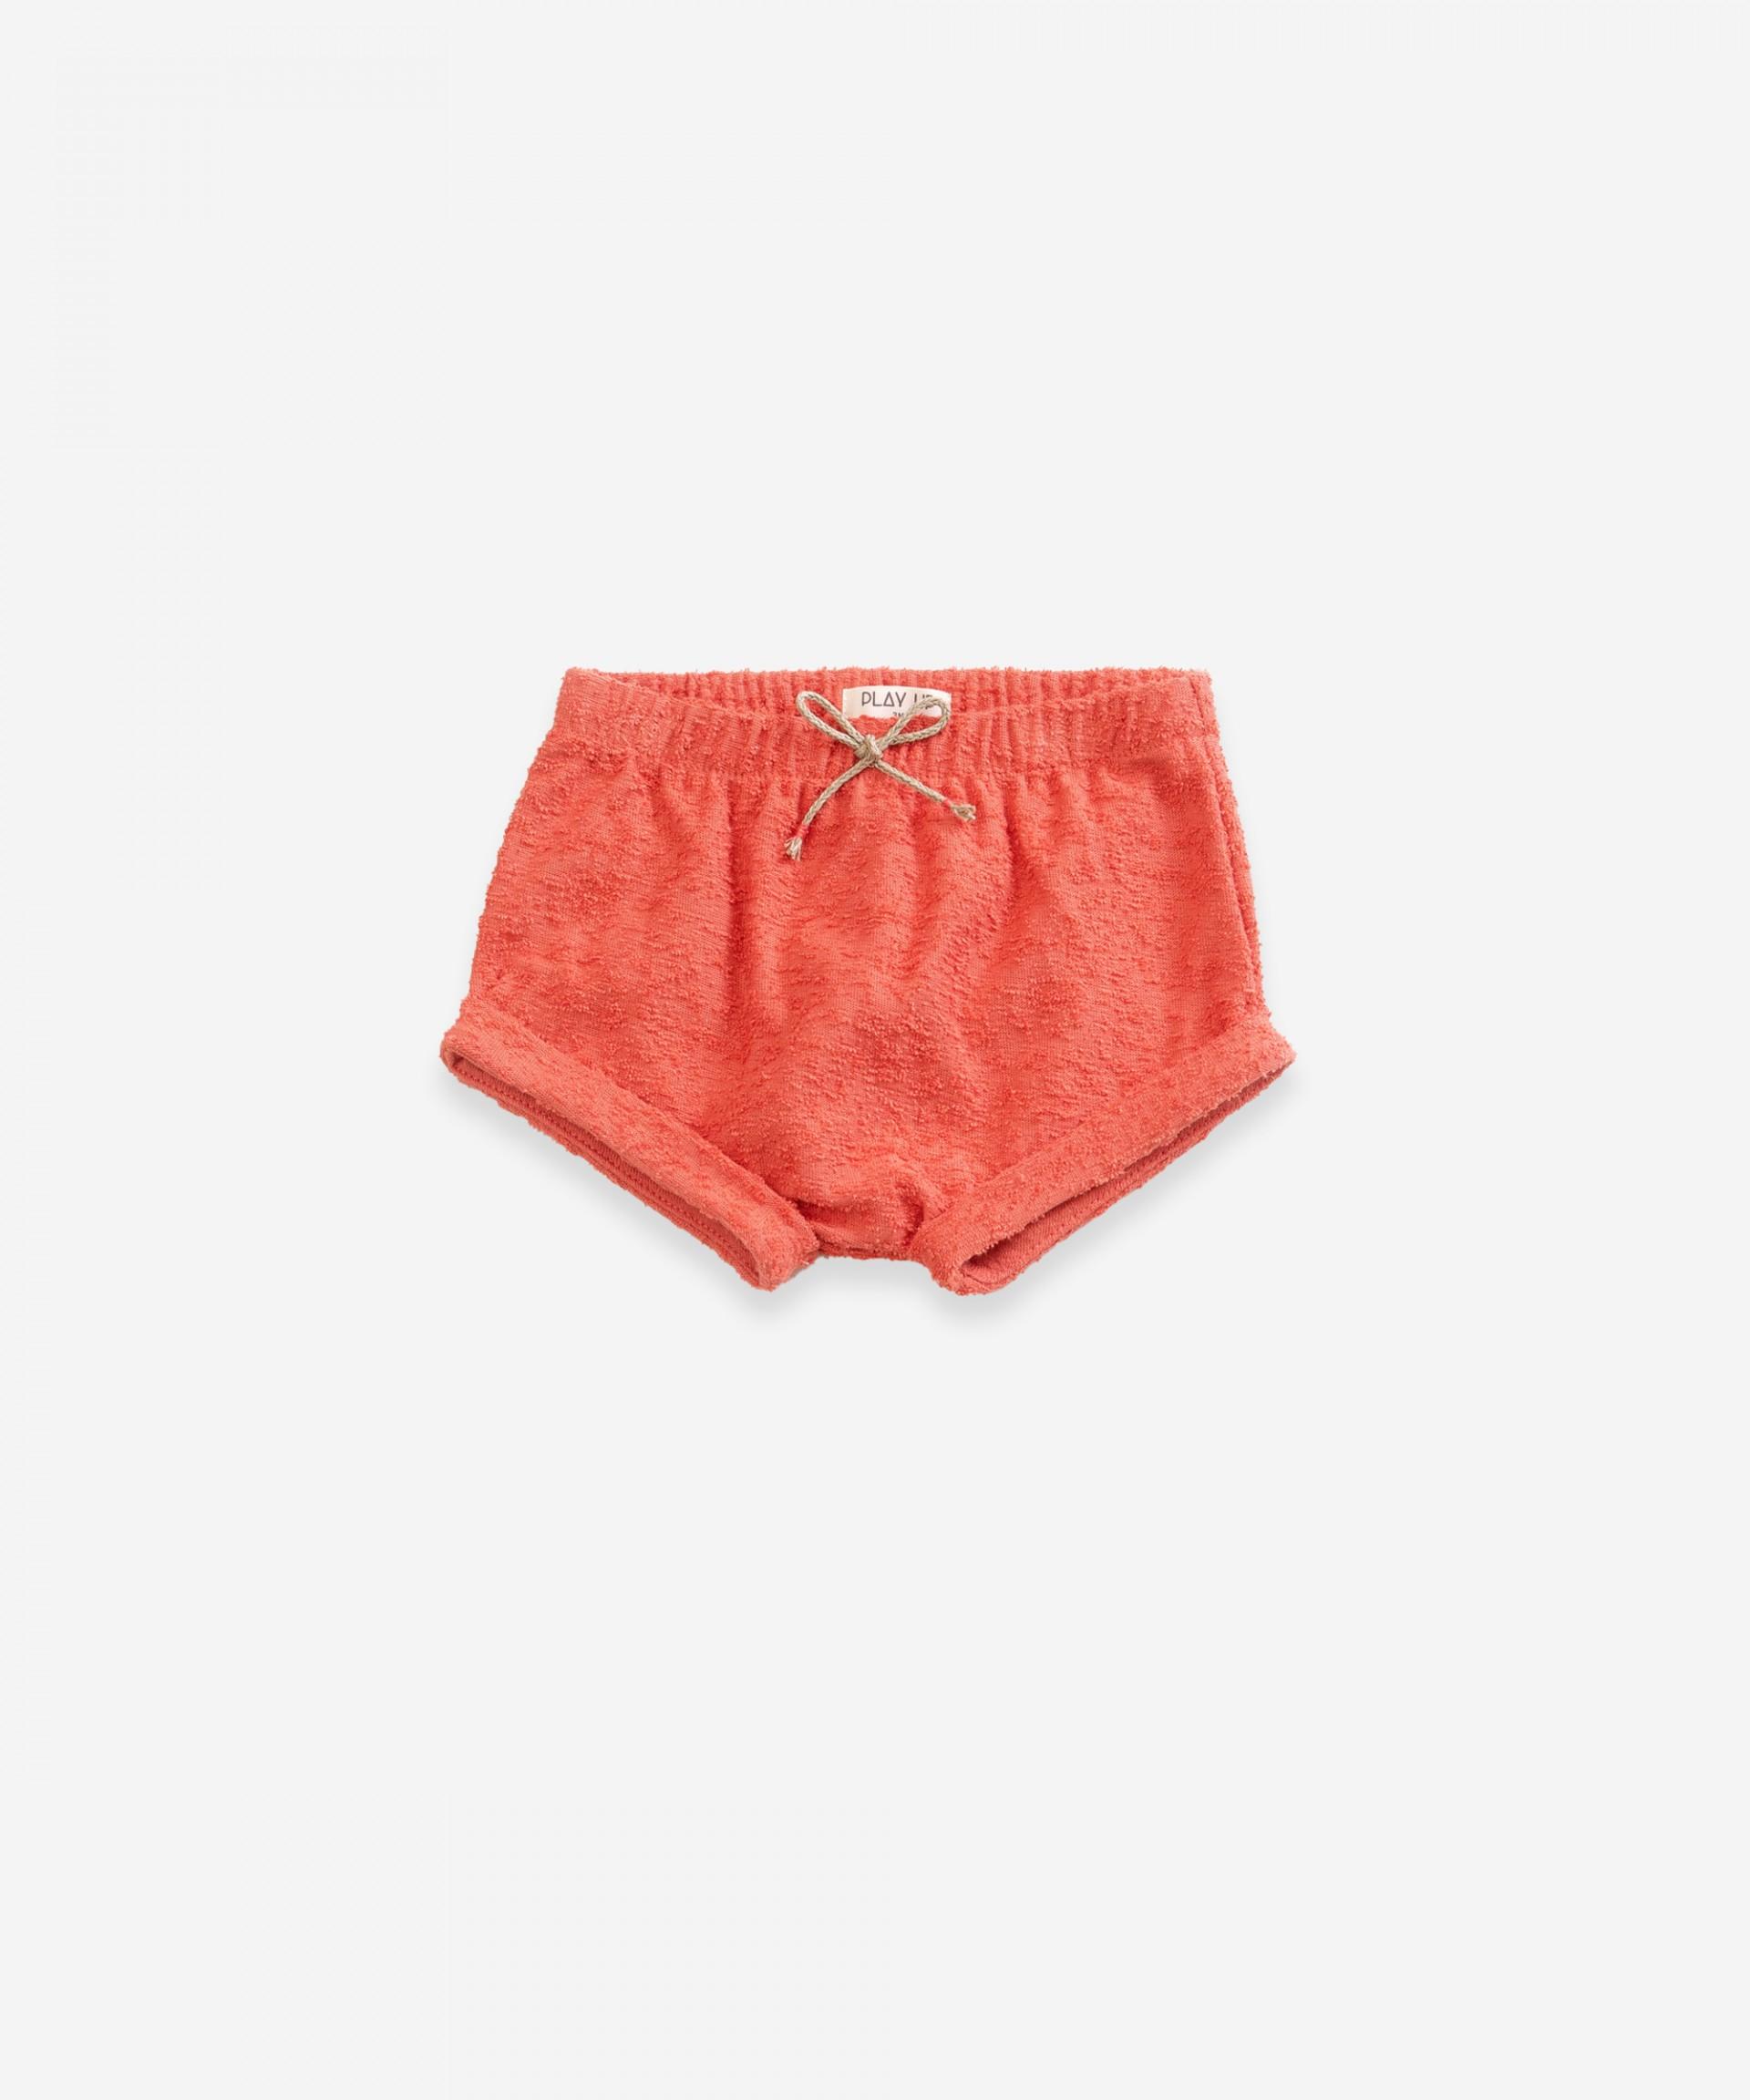 Pantaloncini con trama | Weaving